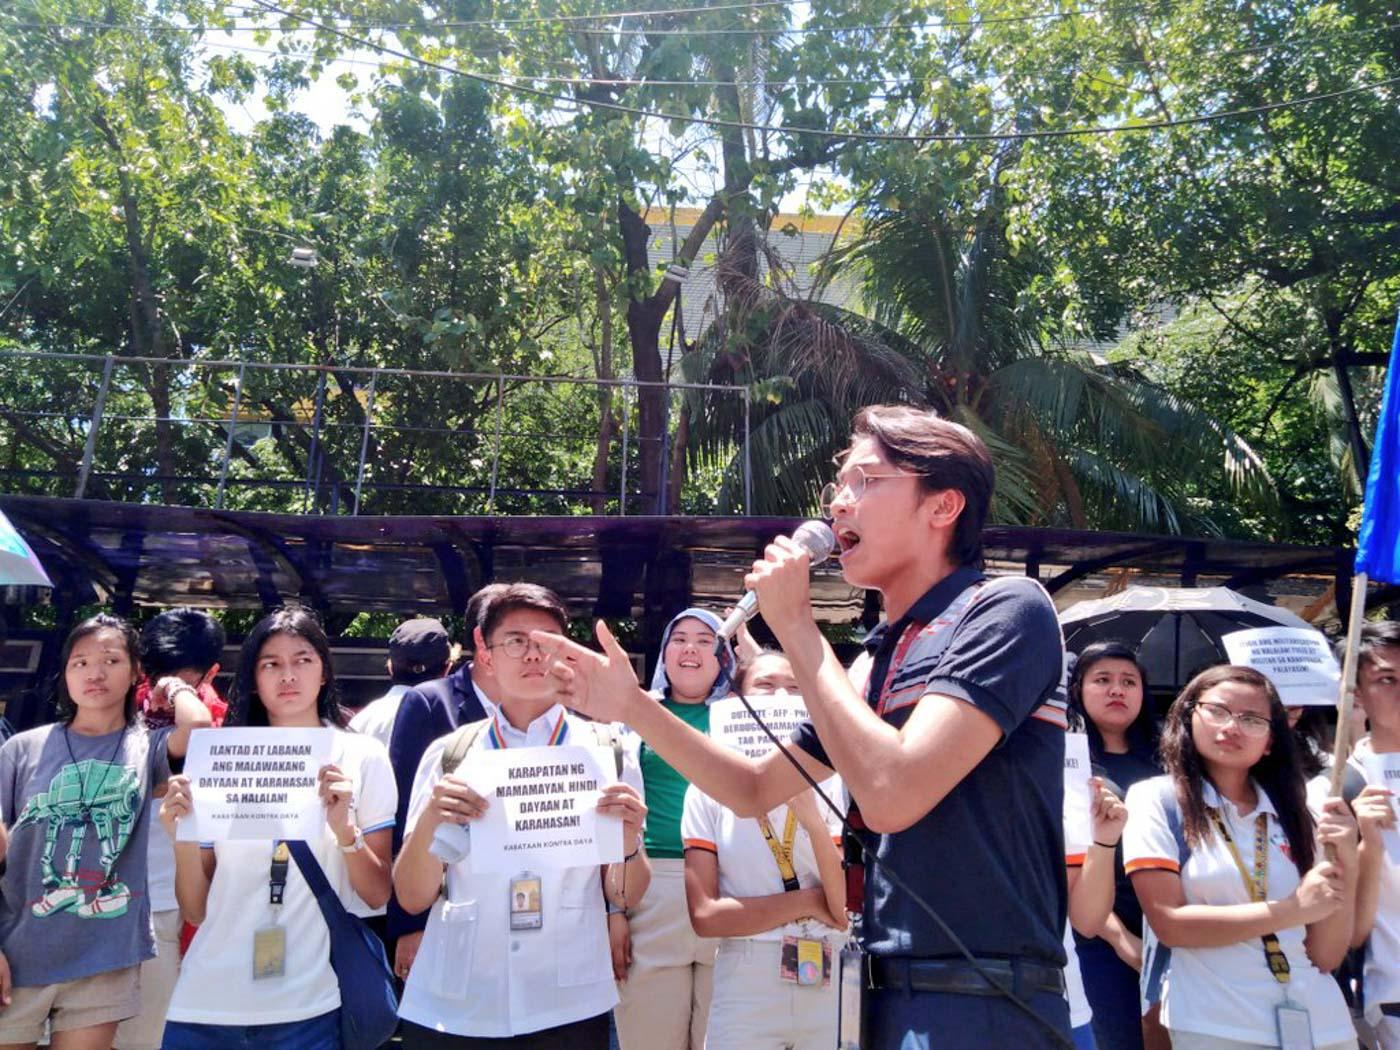 UST. Panday Sining's Angelo del Rosario speaks before protesters at the University of Santo Tomas in Manila. Photo by Jomar Villanueva/Rappler